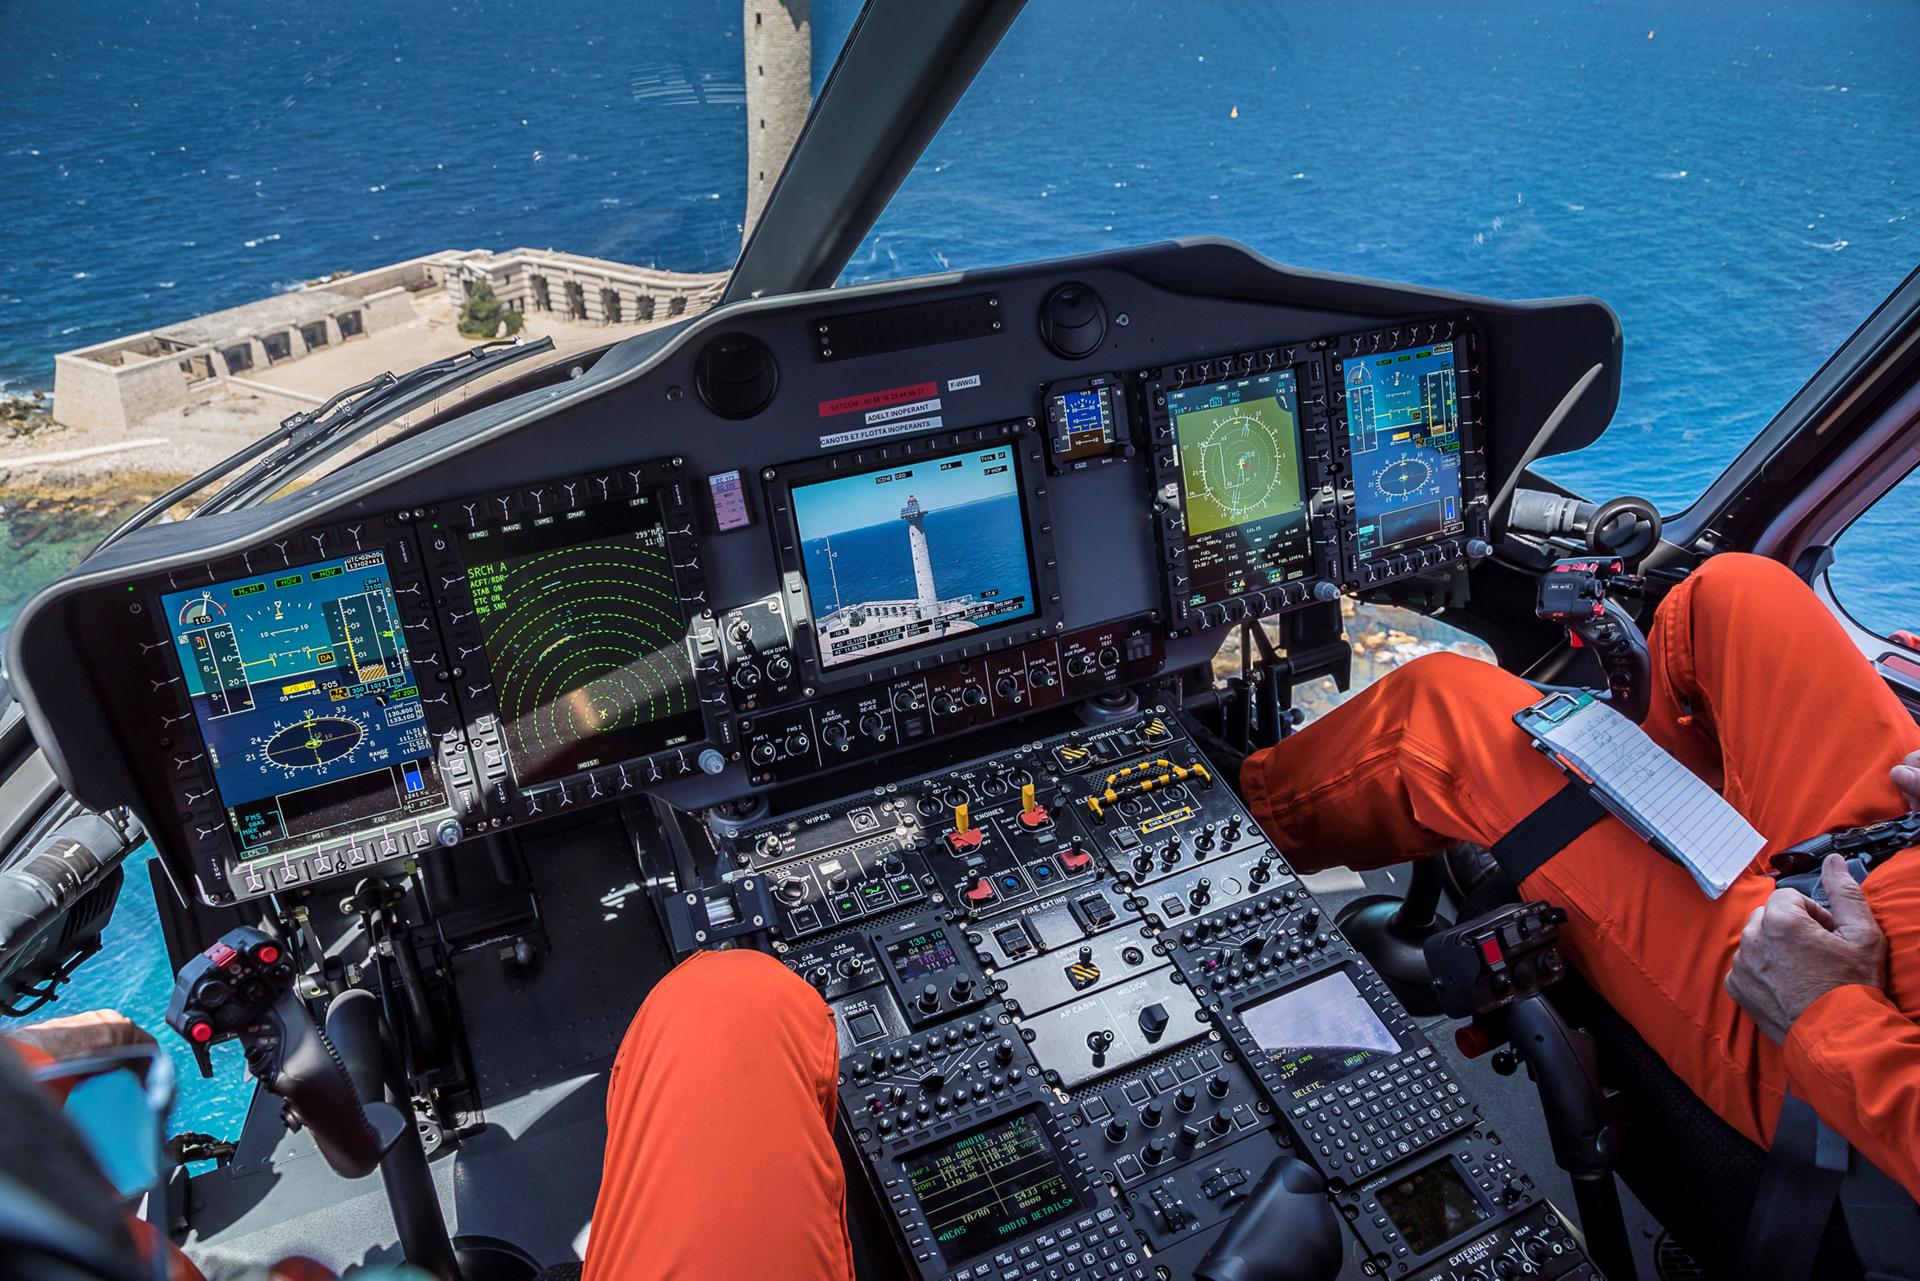 A view of a cockpit layout for Airbus' Helionix avionics suite.